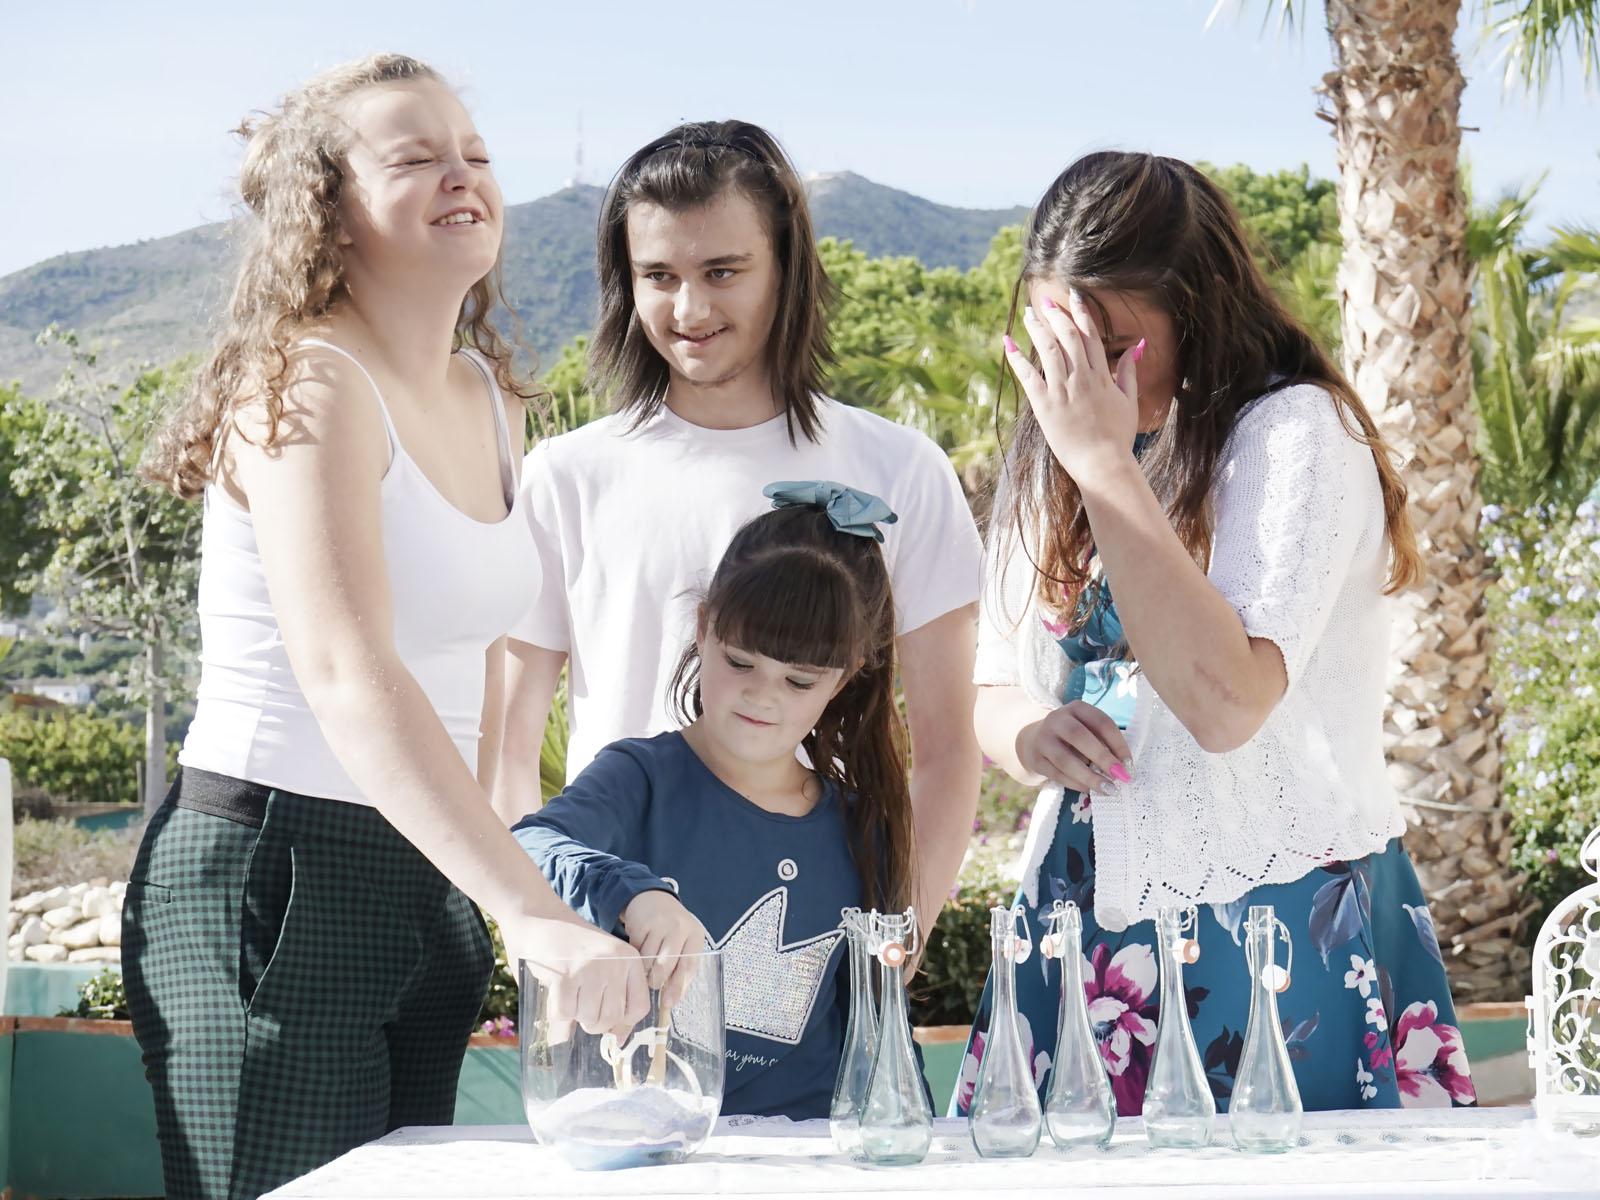 Family unity ceremony at baby naming in Malaga Spain